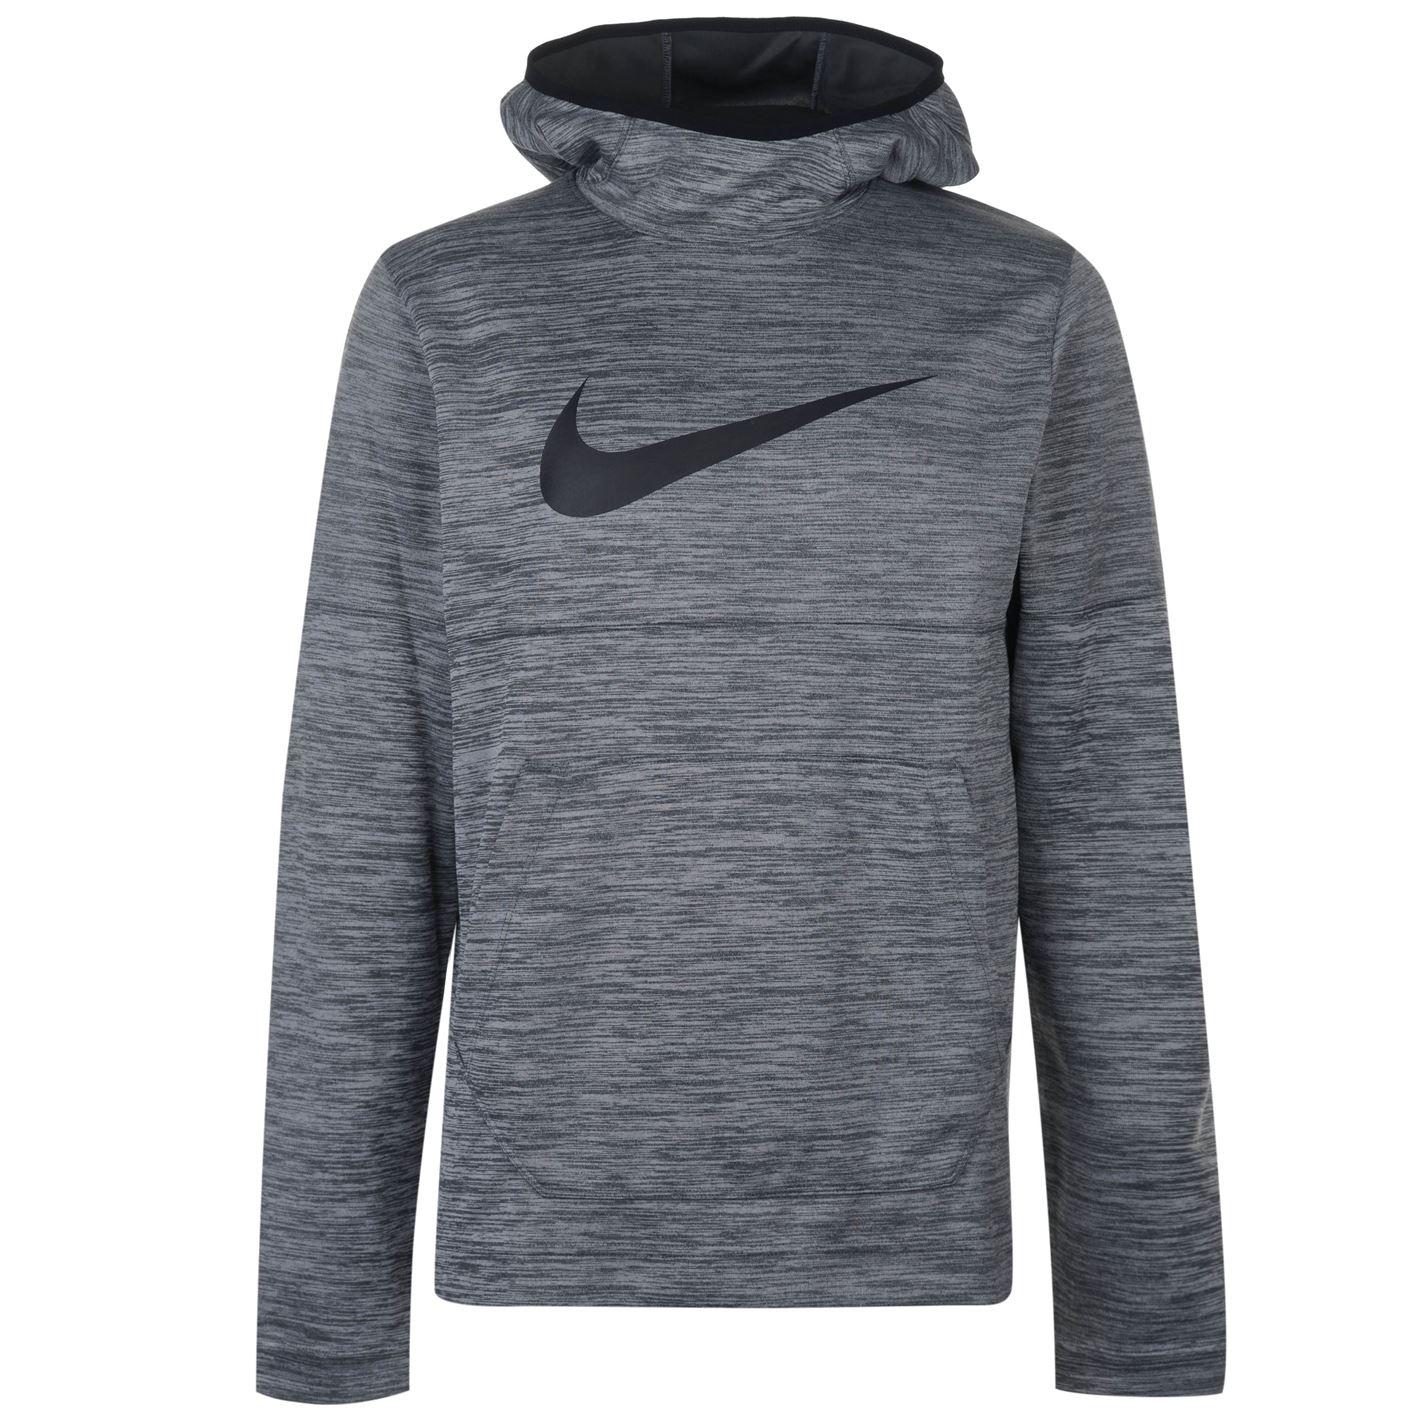 Nike Spotlight OTH pánska mikina